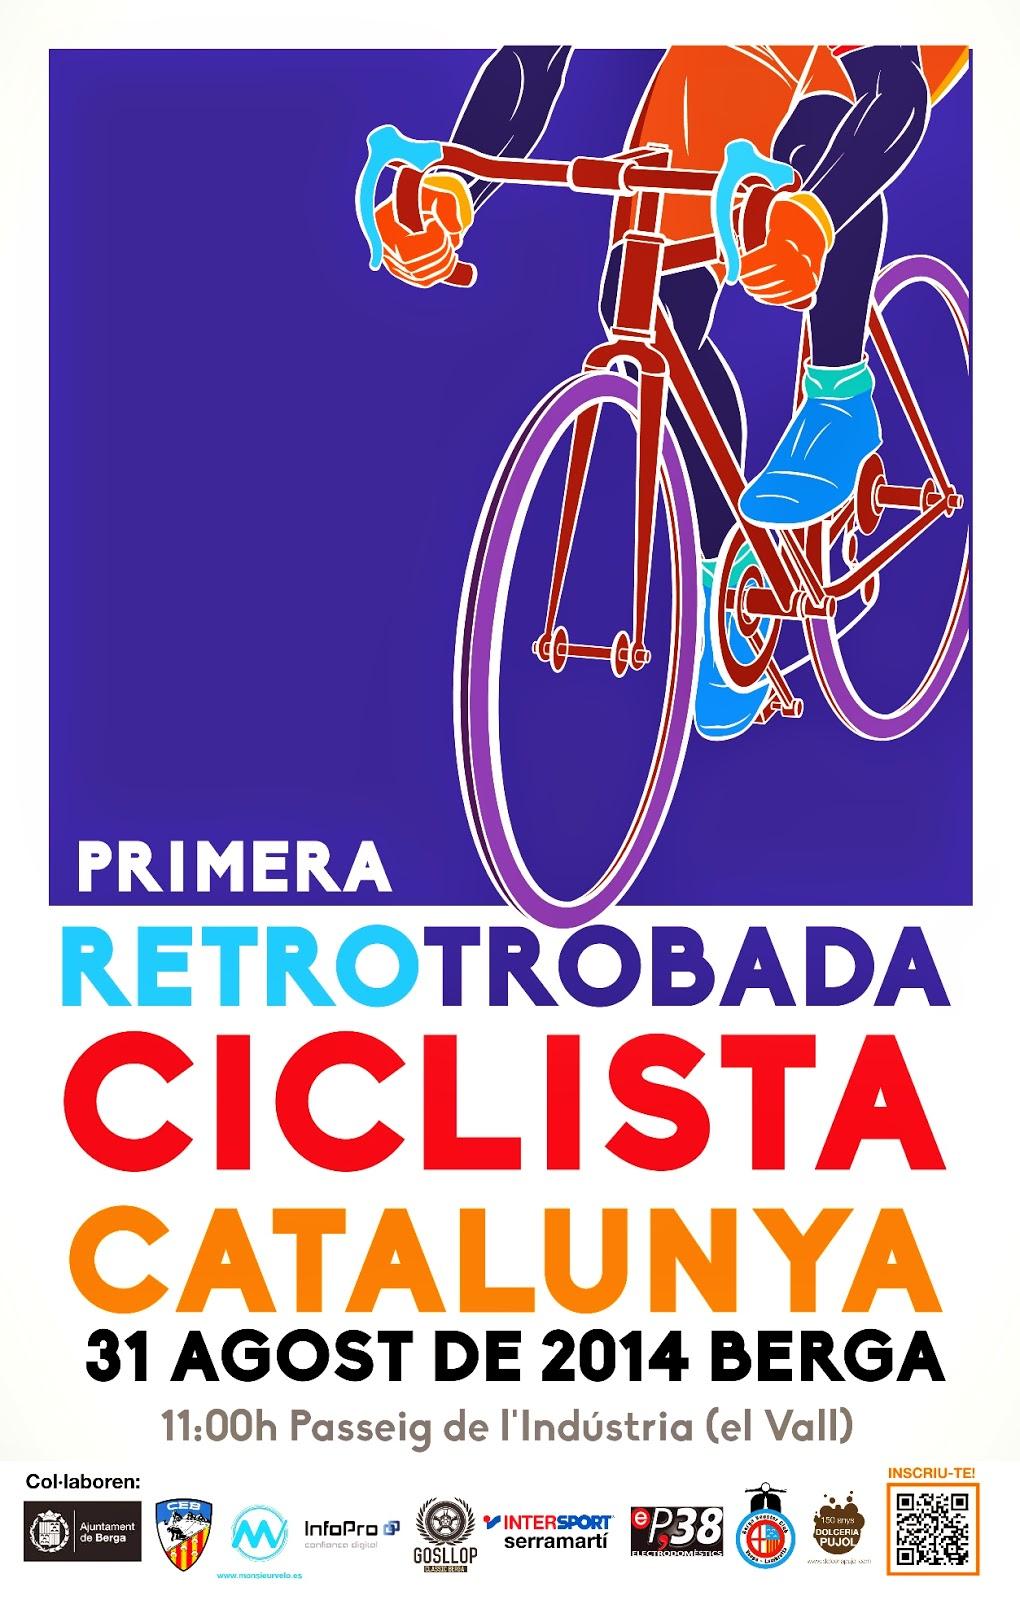 http://retrotrobada.wordpress.com/benvinguts-bienvenidos-wellcome/